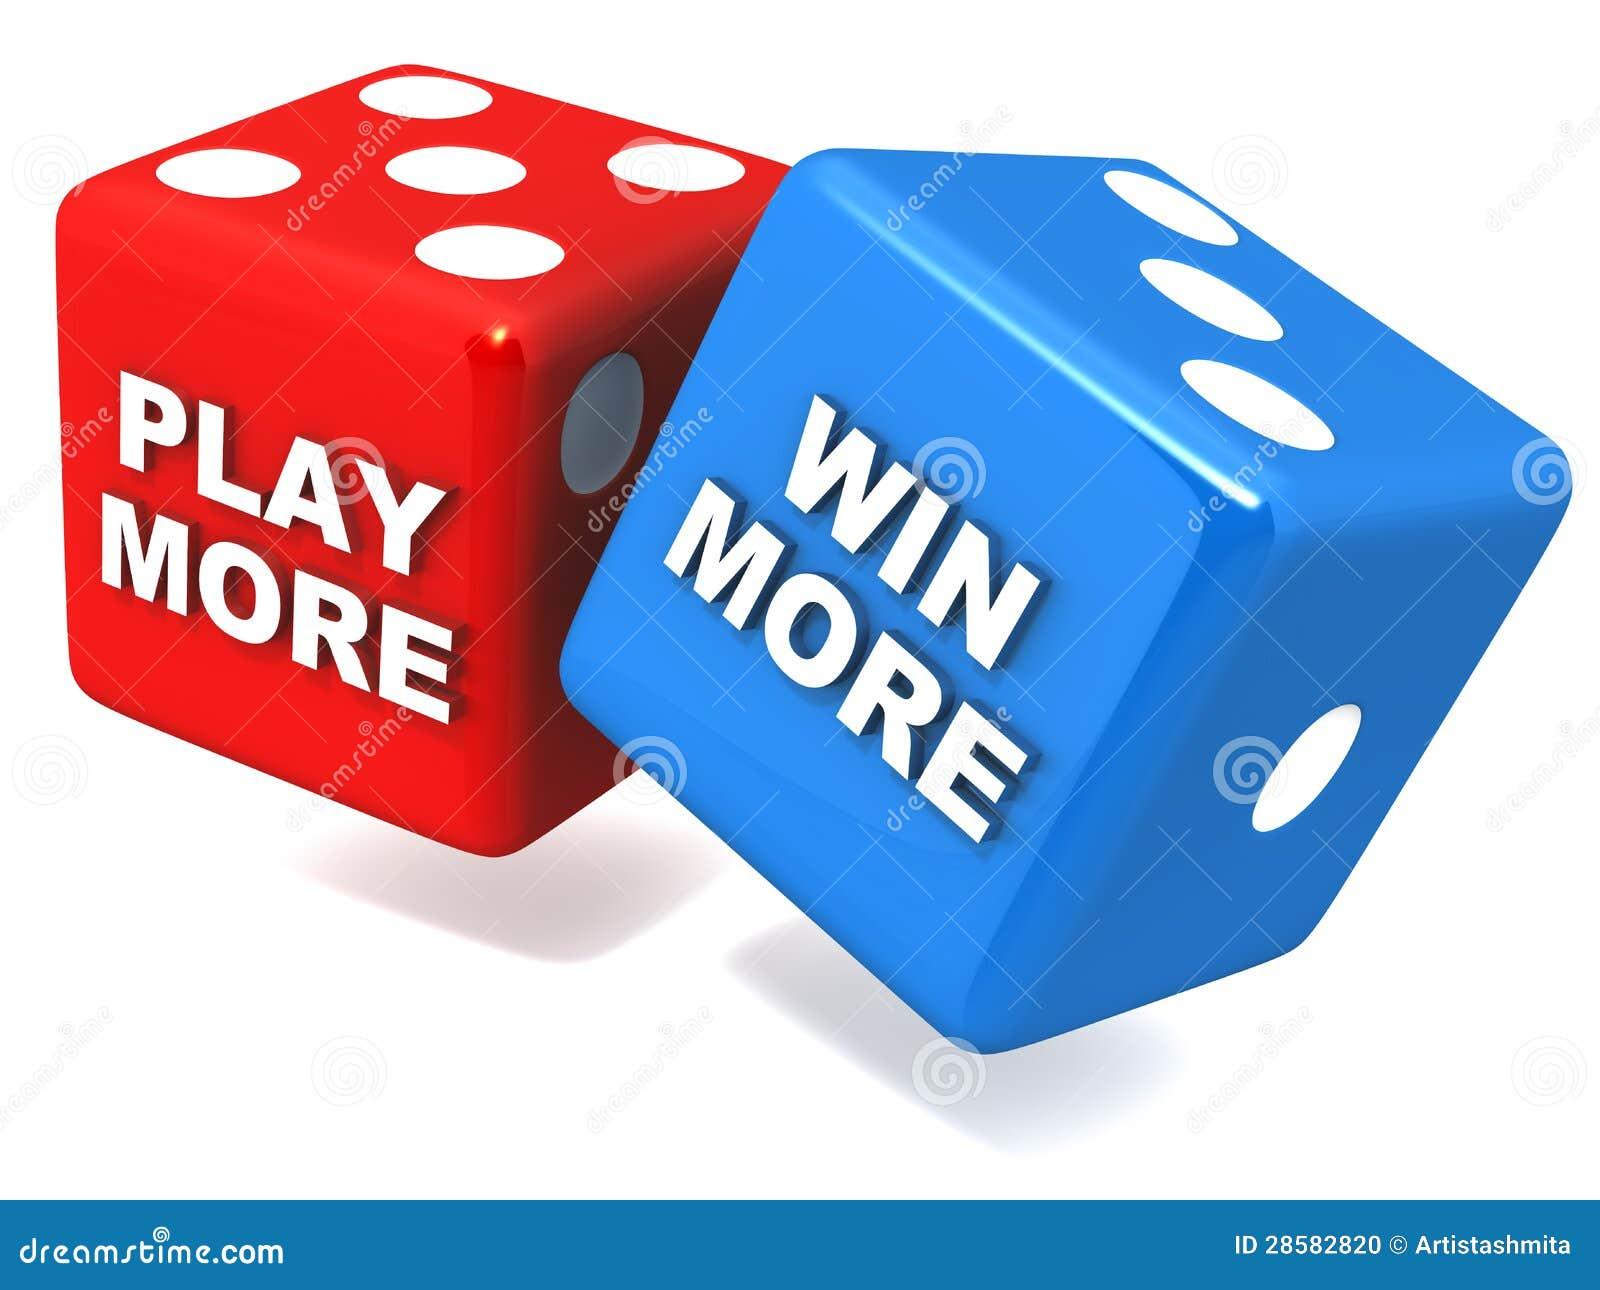 Playing and winning